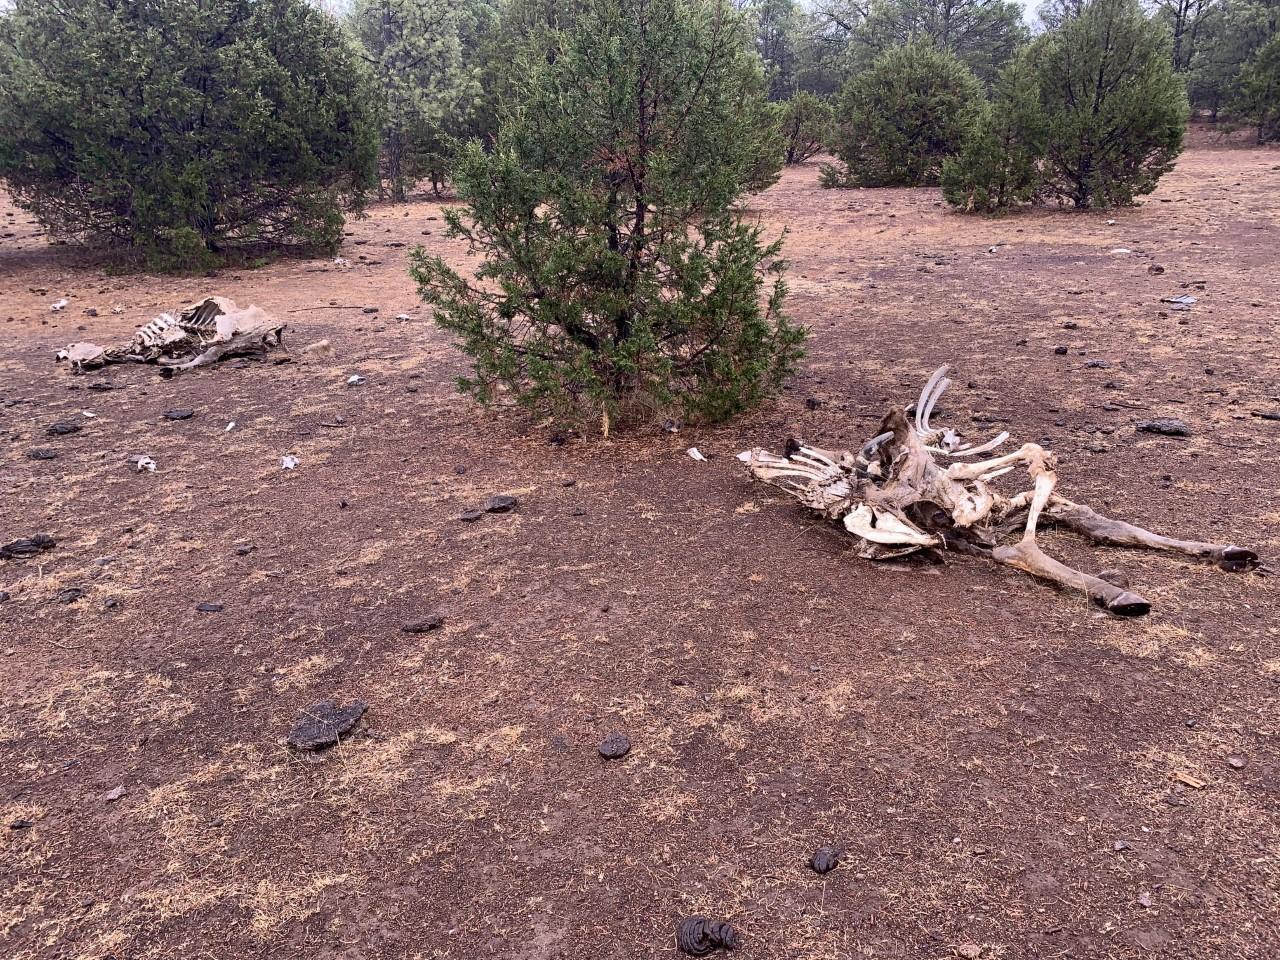 Suman 2,337 reses muertas por sequía en Durango capital